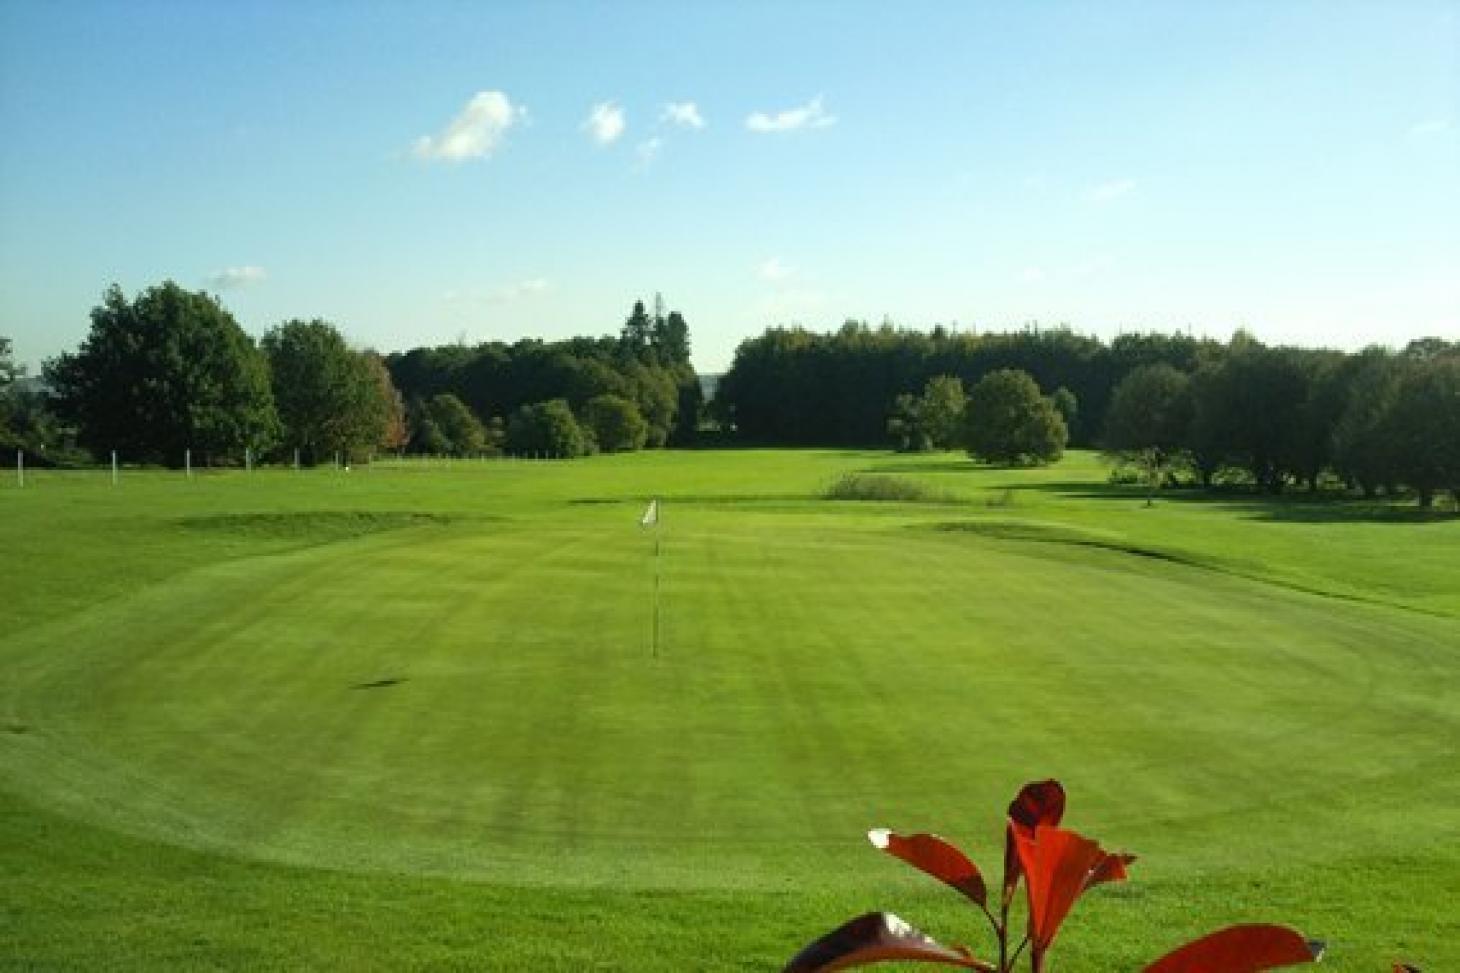 Lullingstone Park Golf Course 18 hole golf course